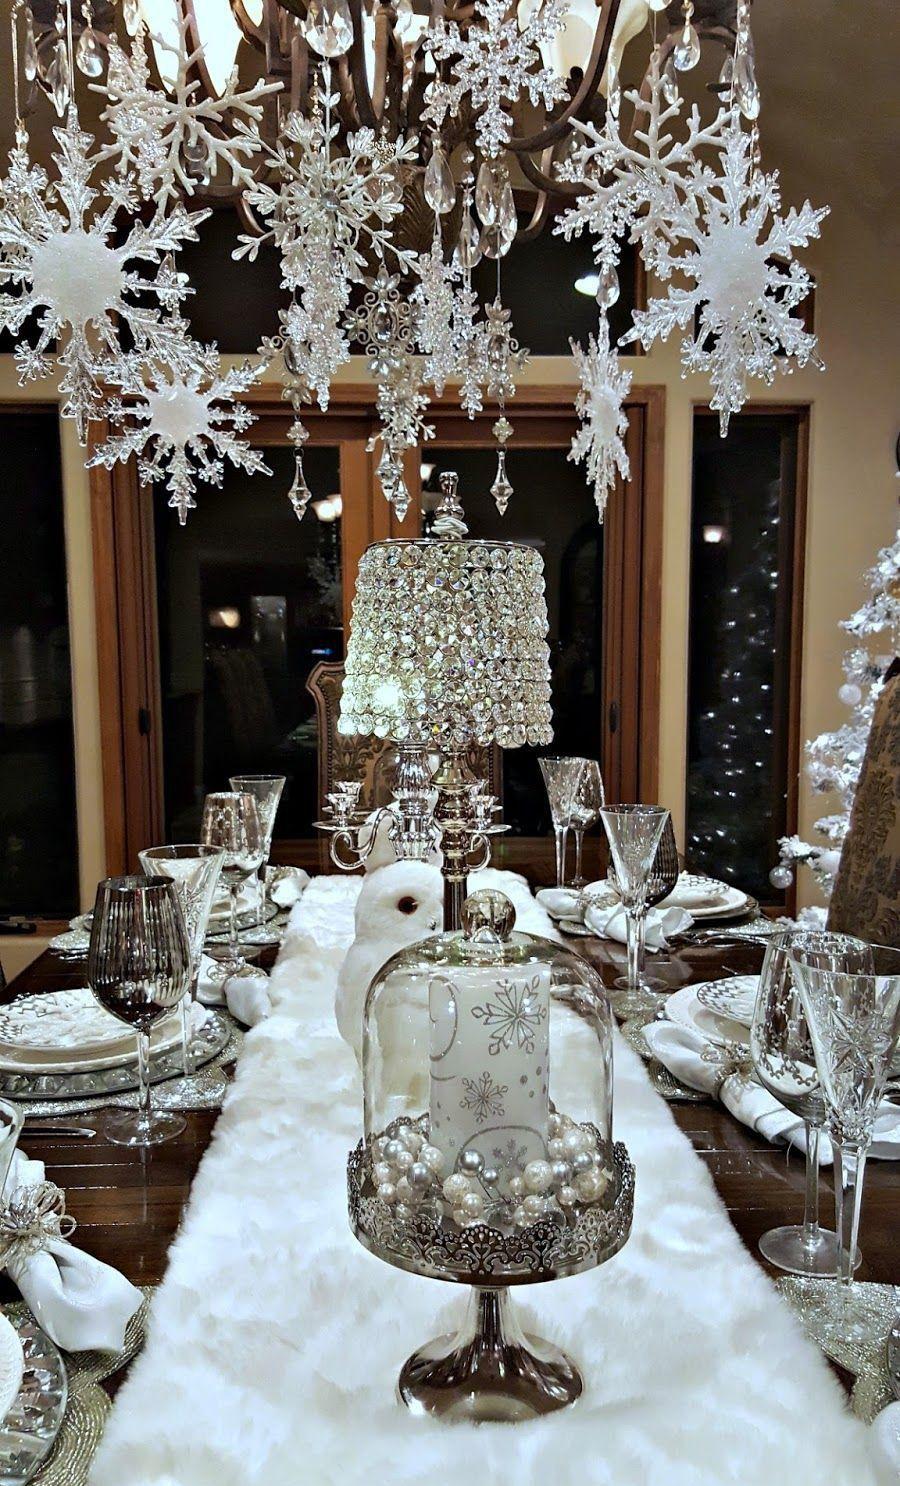 Winter Wonderland Tablescape Christmas Chandelier Christmas Centerpieces Christmas Table Decorations